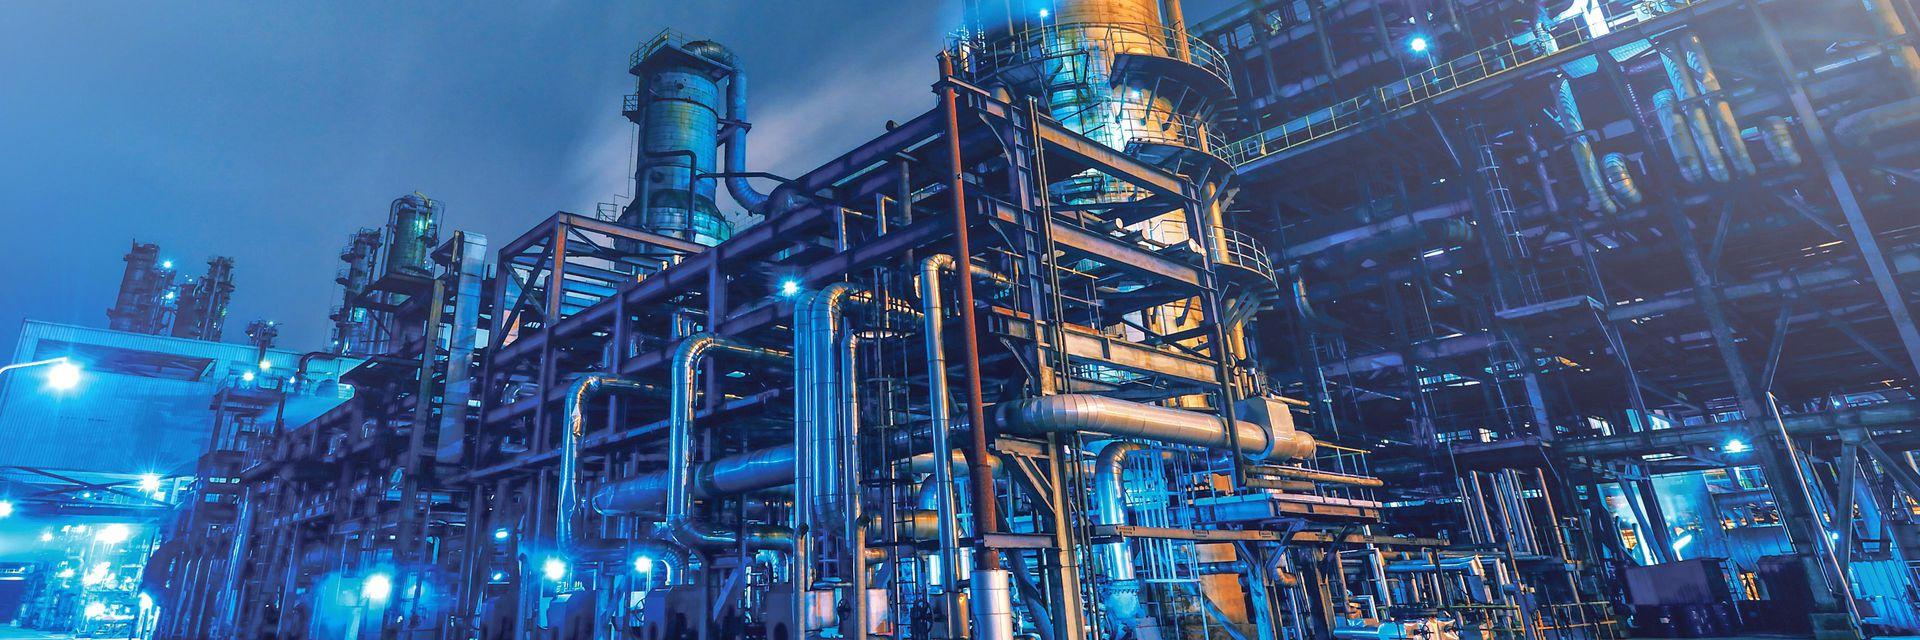 شرکت سرمايهگذاري صنايع شيميايي ايران